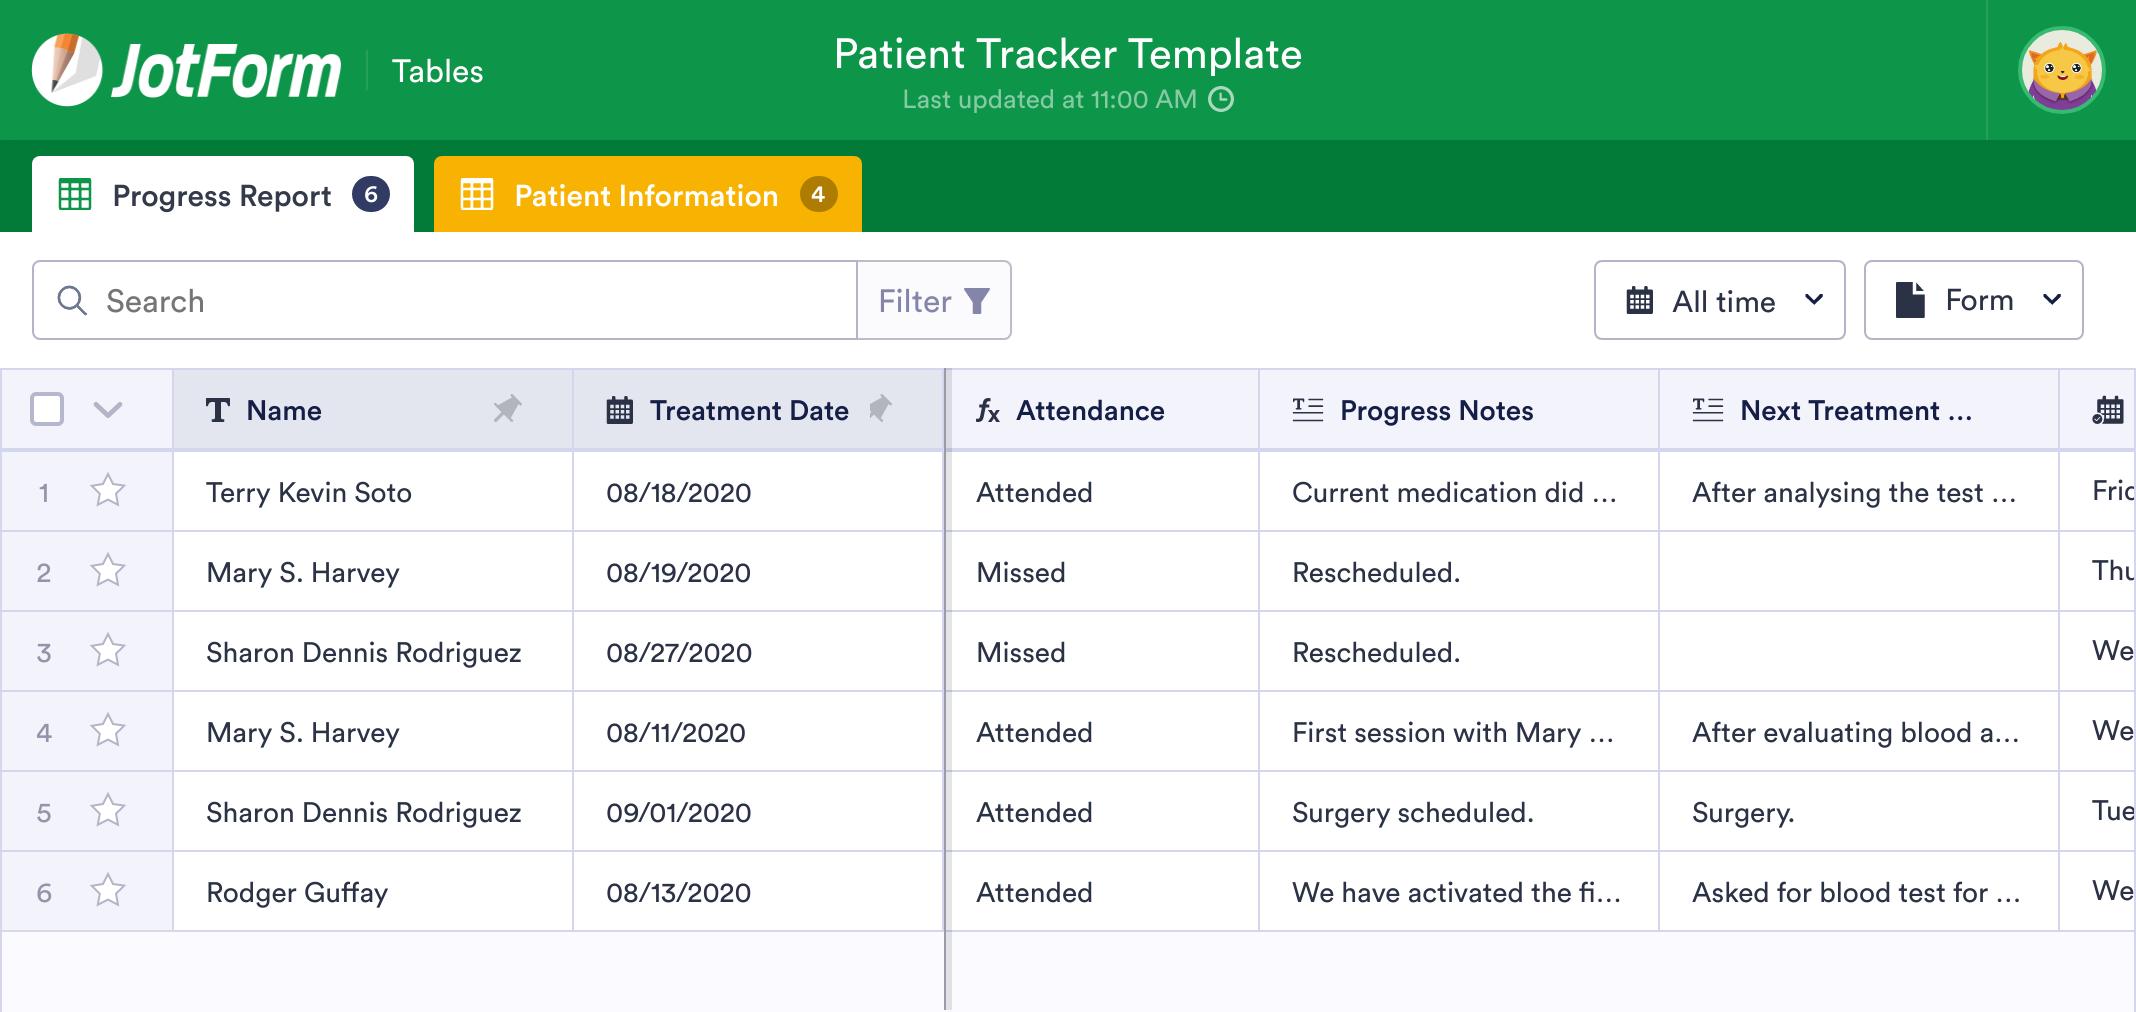 Patient Tracker Template